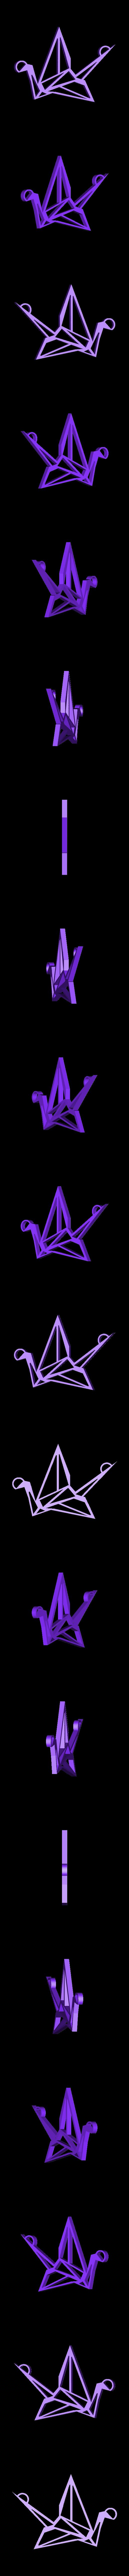 "cigne.stl Download free STL file Geometric pendant ""Swan"" (Origami type) • 3D printer model, Samothex3D"